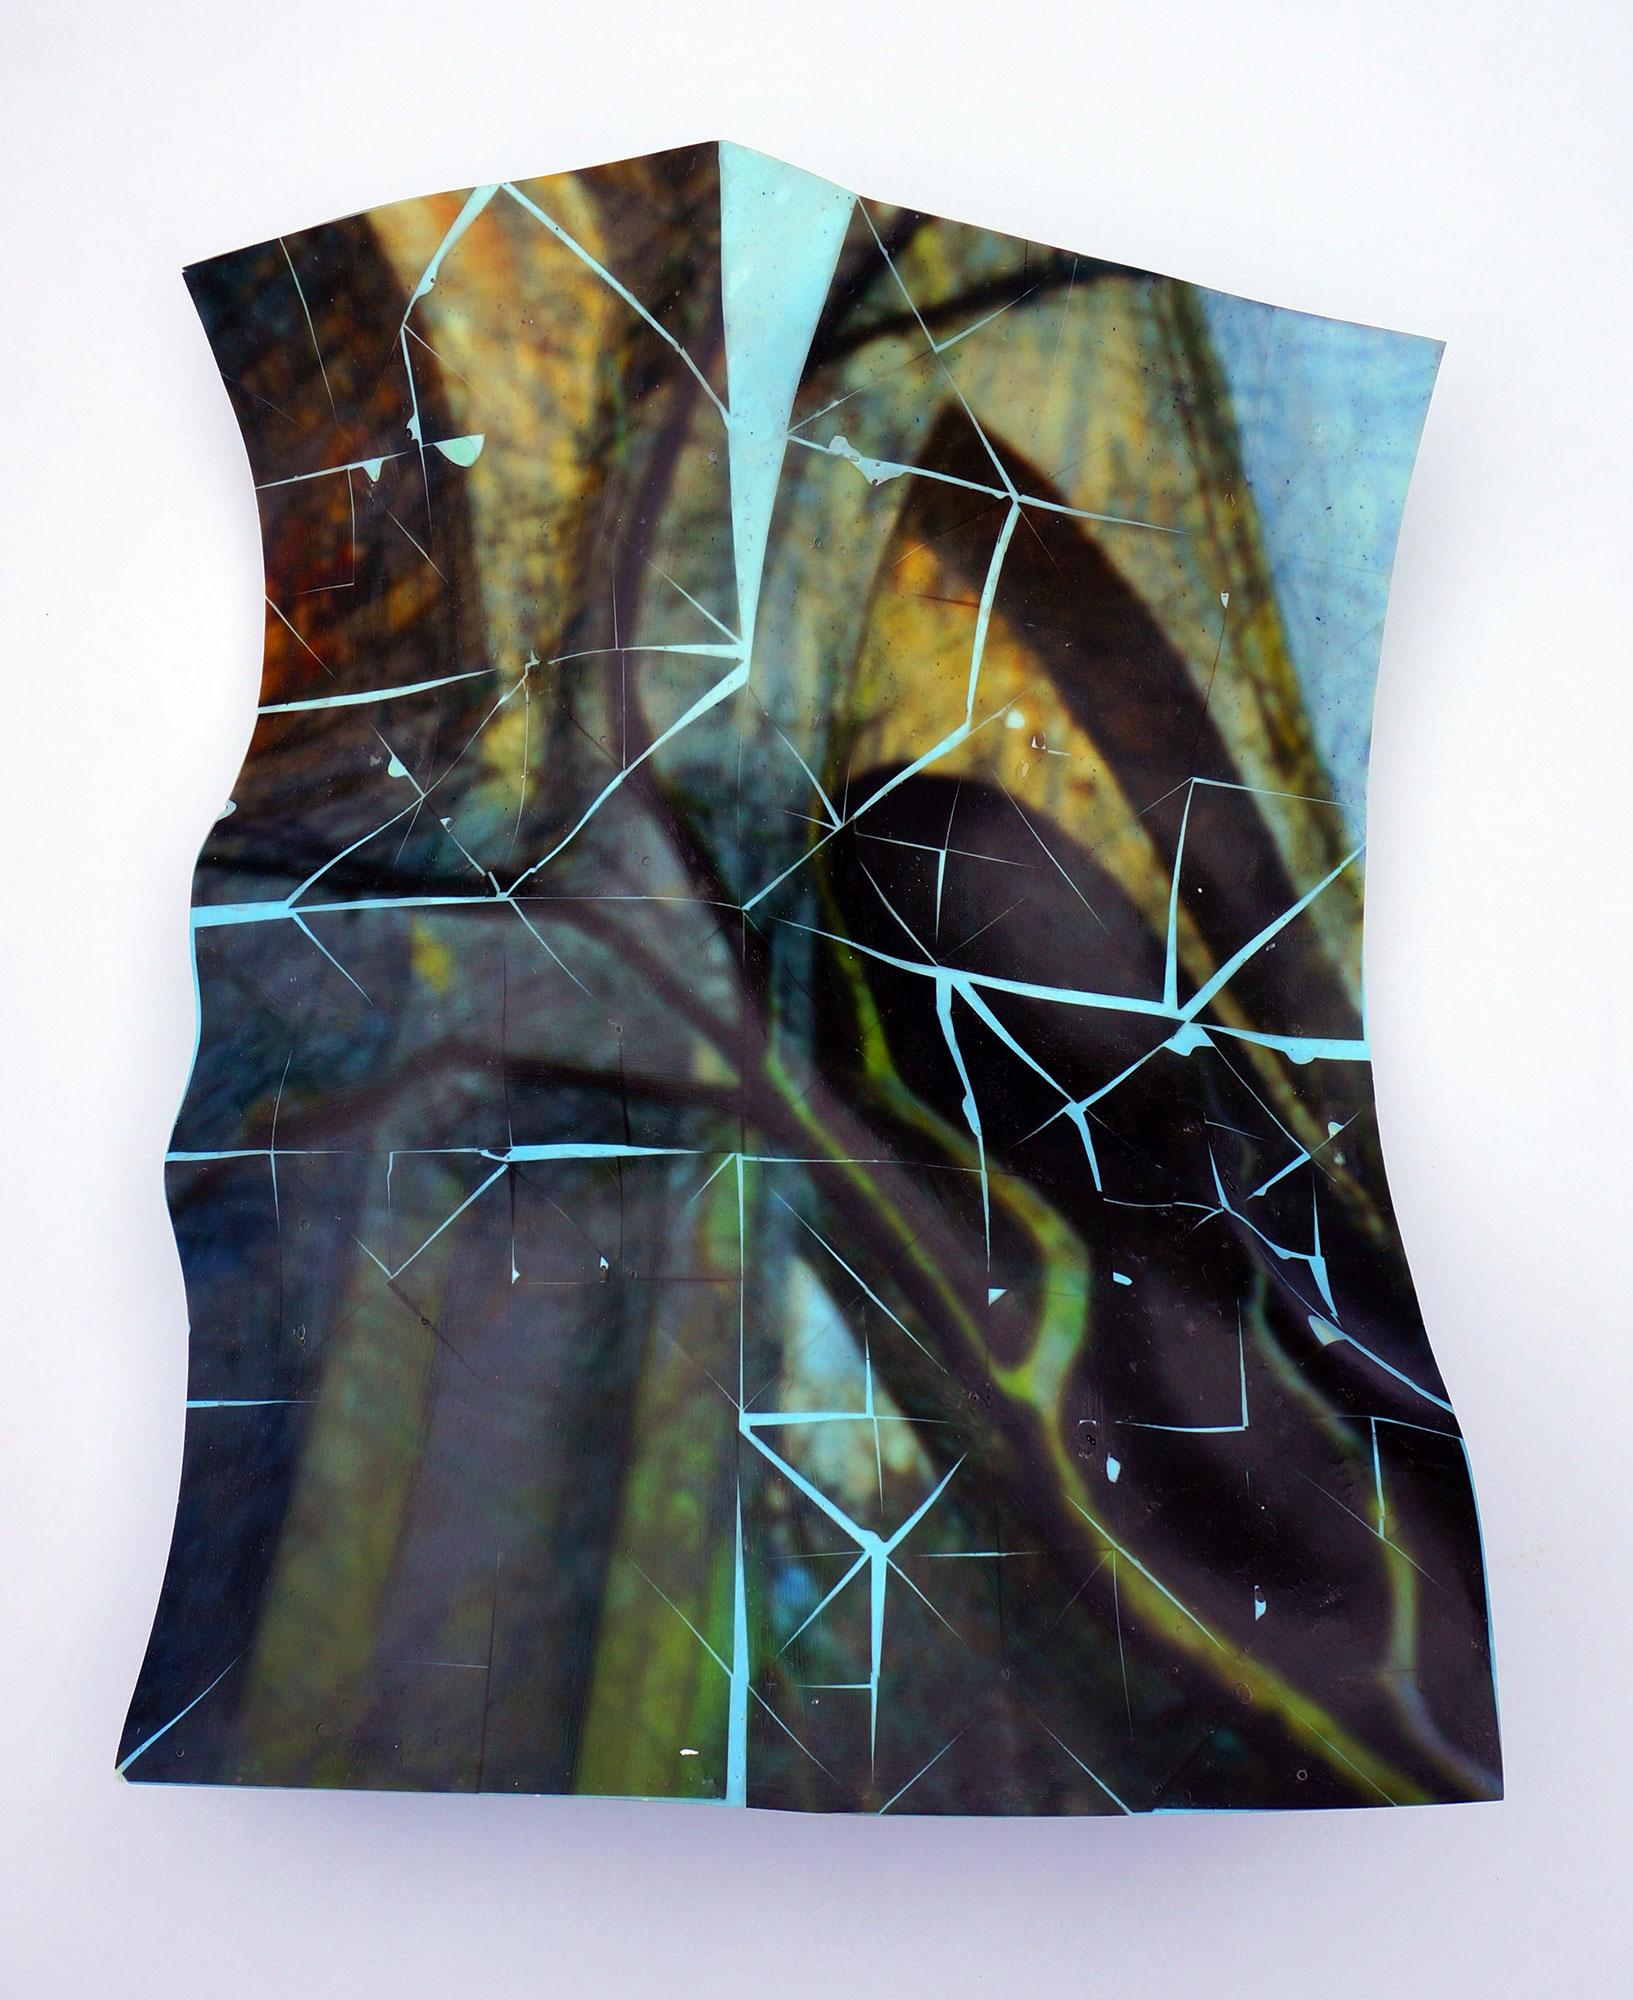 Bridge and Tree (Version 2), 2021, 48x40x13cms